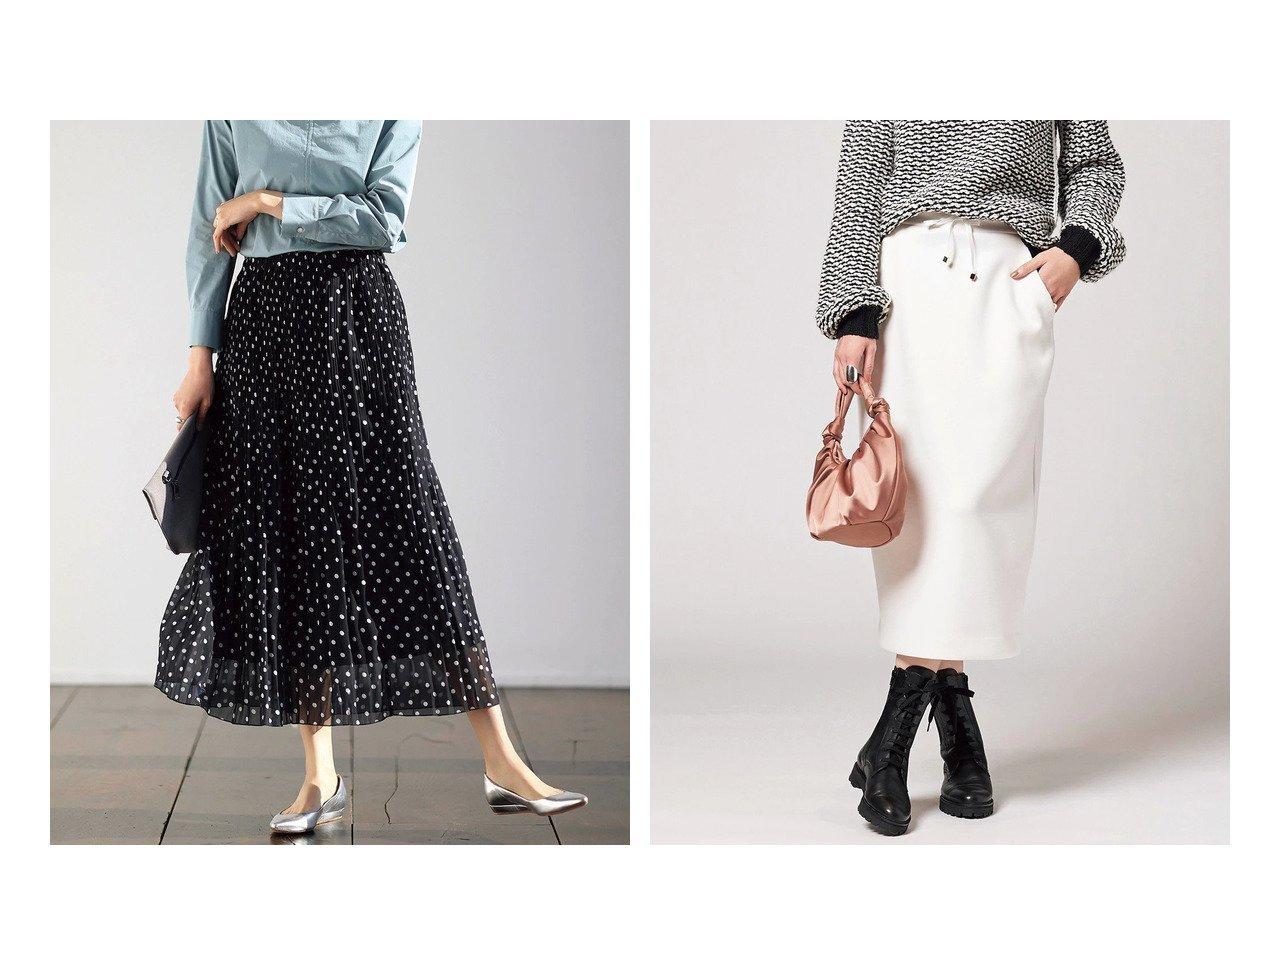 【DoCLASSE/ドゥクラッセ】のドットシフォン・プリーツスカート&ファインスウェット・ストレートスカート ドゥクラッセの40代、50代の方におすすめ!人気トレンド・ファッションの通販 おすすめで人気の流行・トレンド、ファッションの通販商品 メンズファッション・キッズファッション・インテリア・家具・レディースファッション・服の通販 founy(ファニー) https://founy.com/ ファッション Fashion レディースファッション WOMEN スカート Skirt プリーツスカート Pleated Skirts なめらか スウェット セットアップ パーカー 春 Spring ドット フェミニン フレア プリーツ 無地 |ID:crp329100000021642